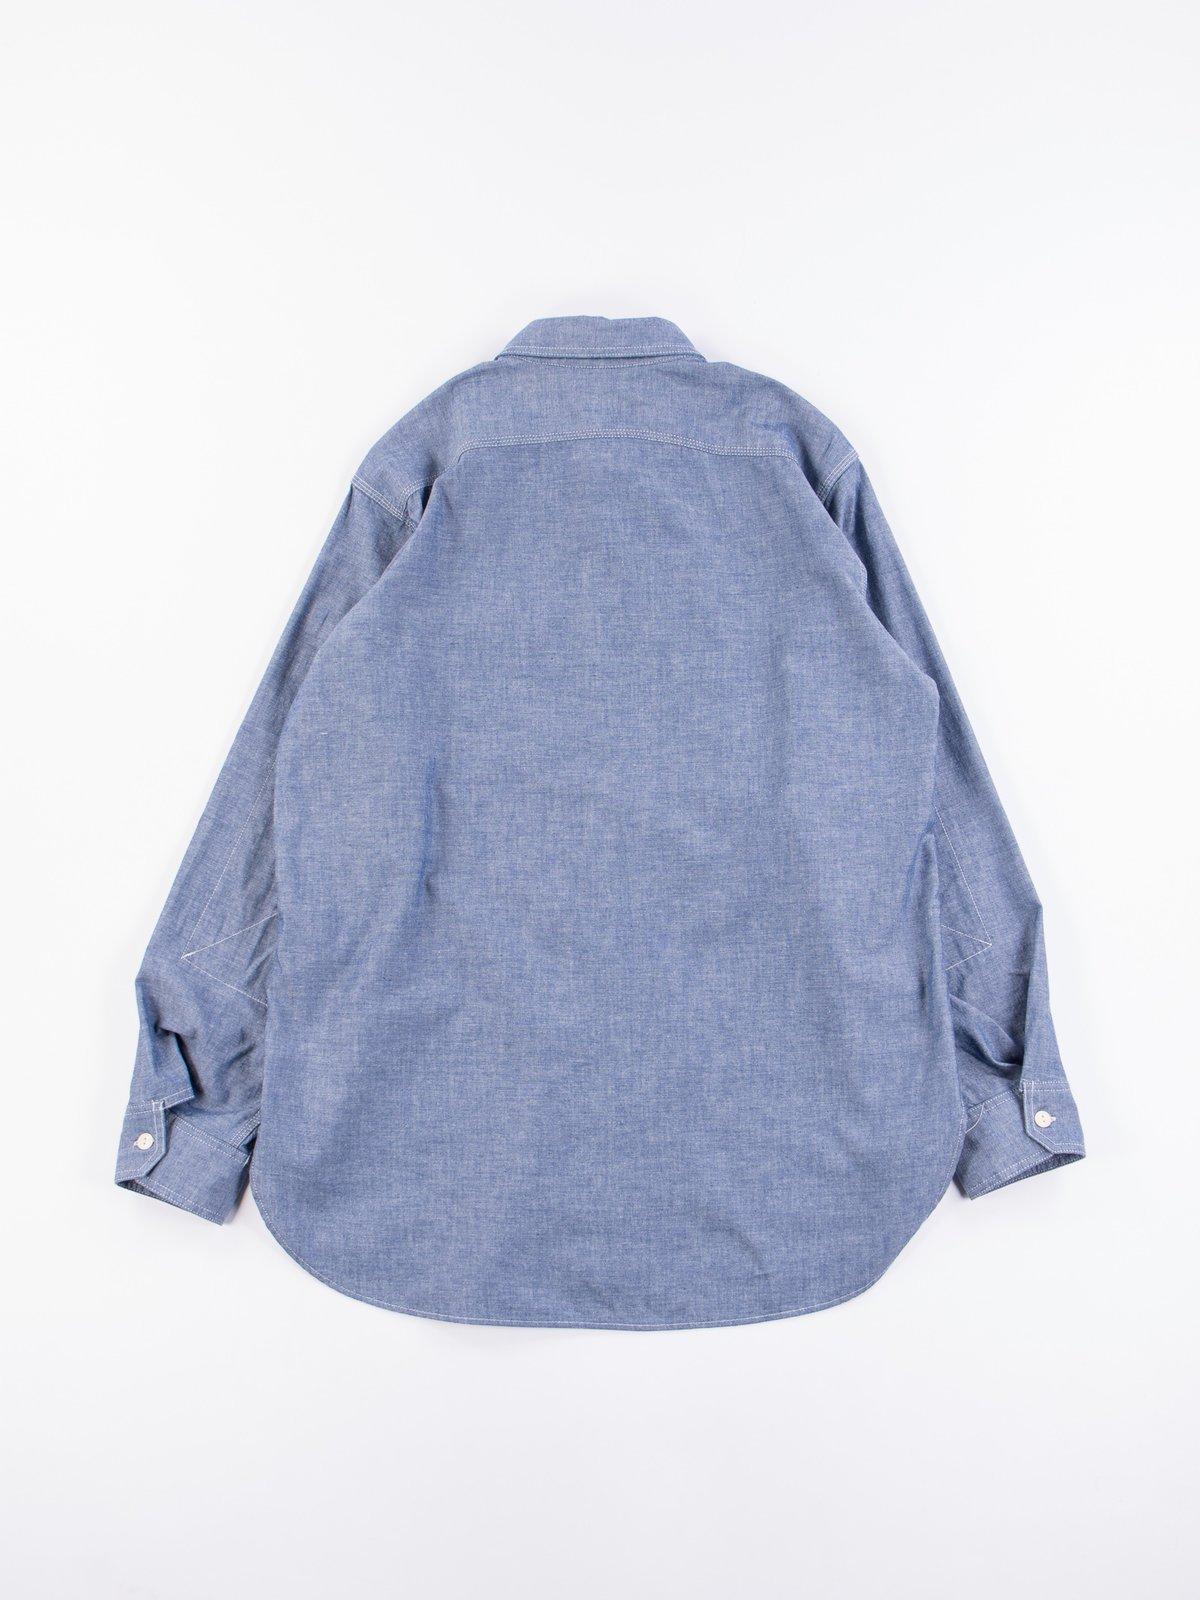 Blue Cotton Chambray Work Shirt - Image 5